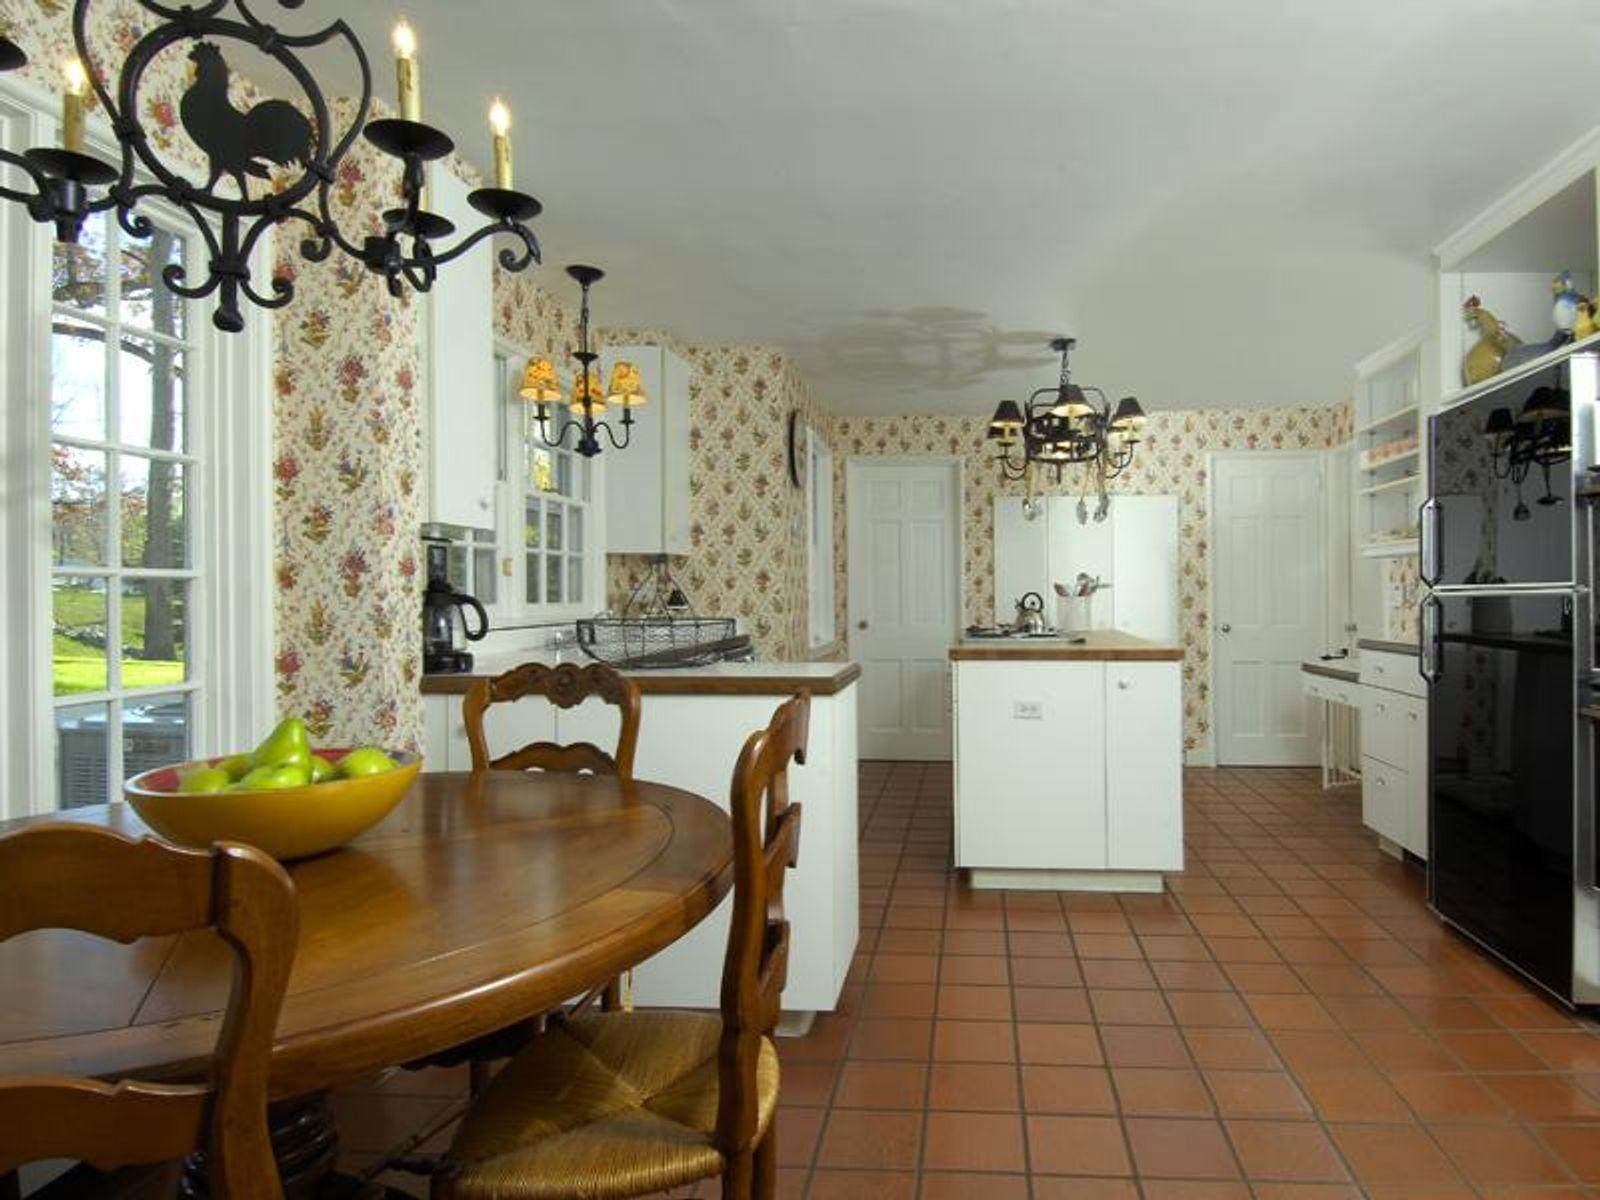 Kitchen with Sunny Breakfast Corner